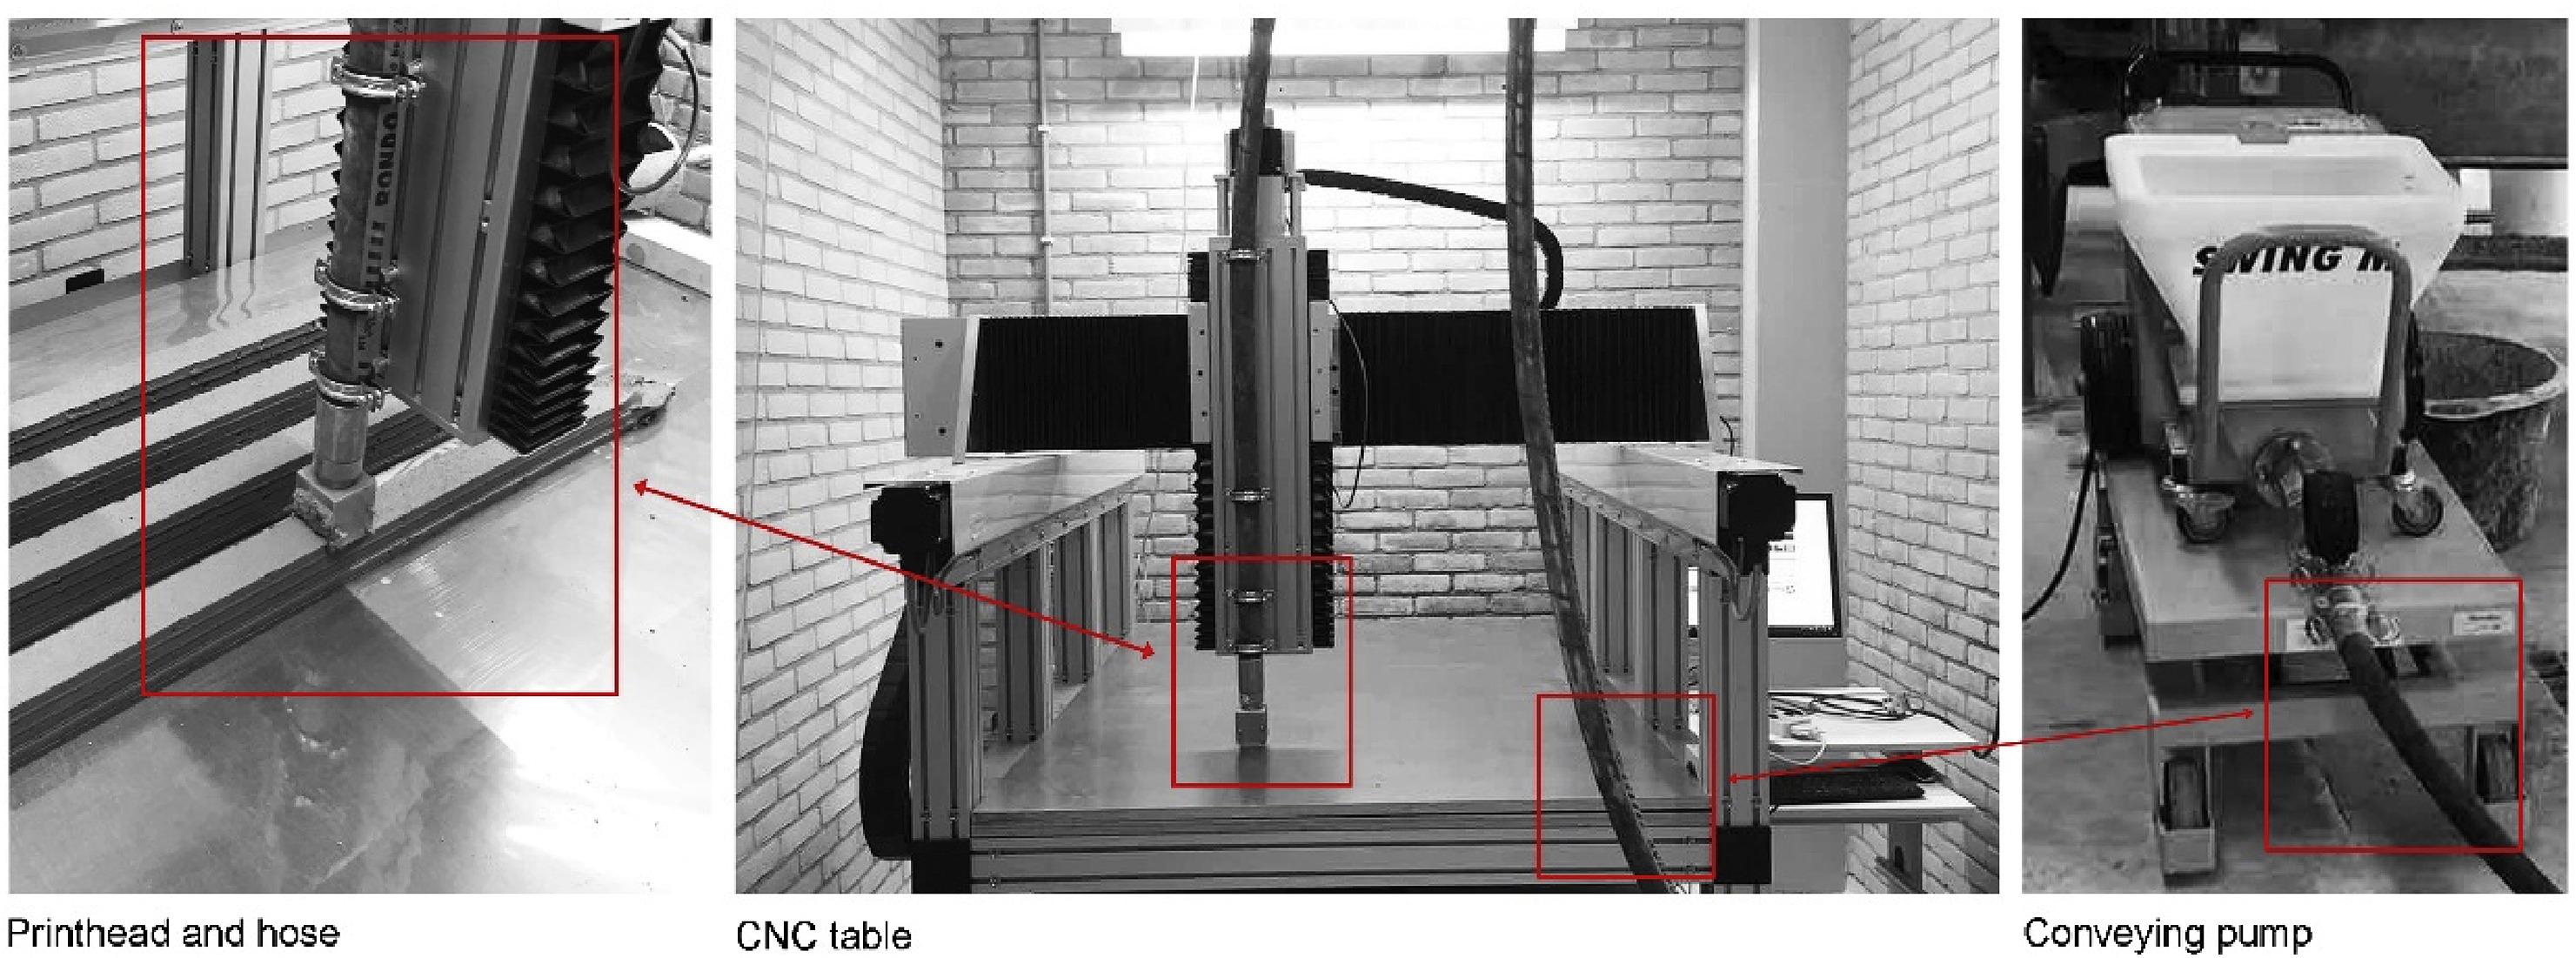 The custom printing setup in the lab. Photos via TU Delft.